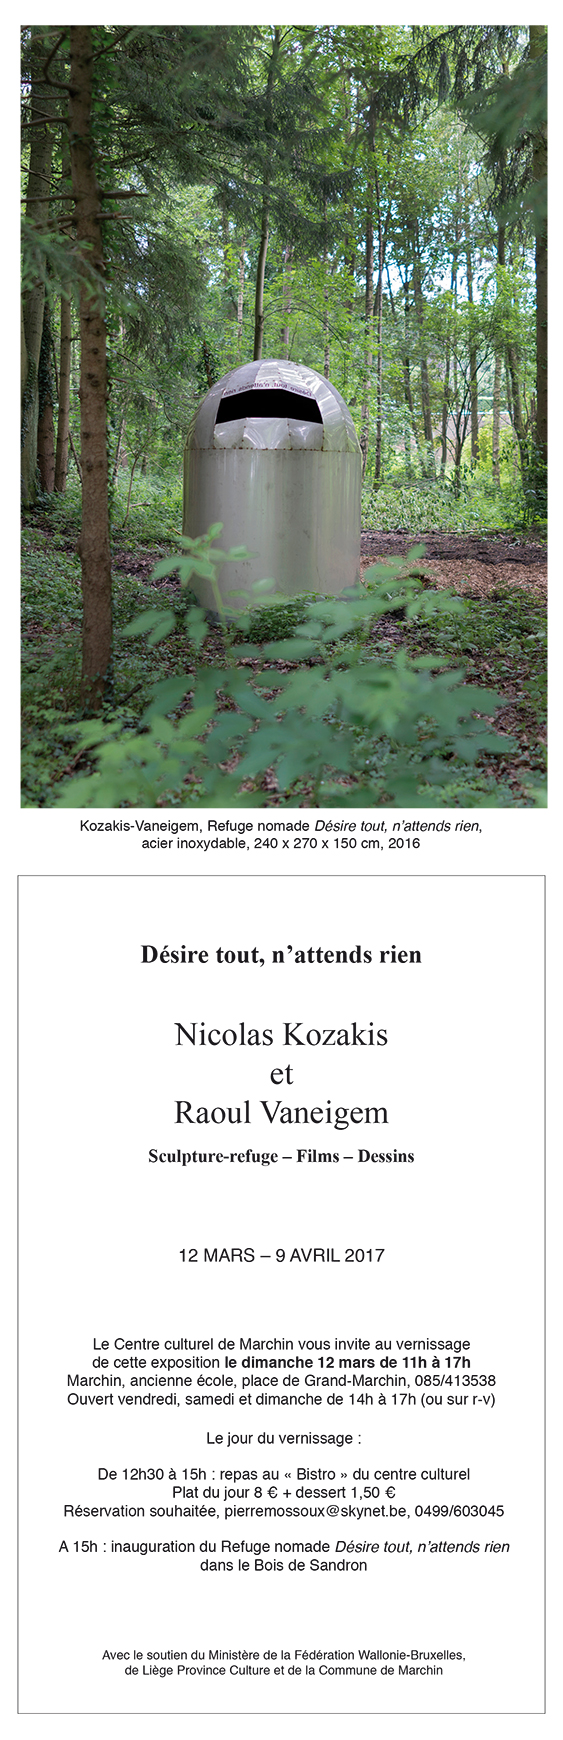 Kozakis_Vaneigem_web